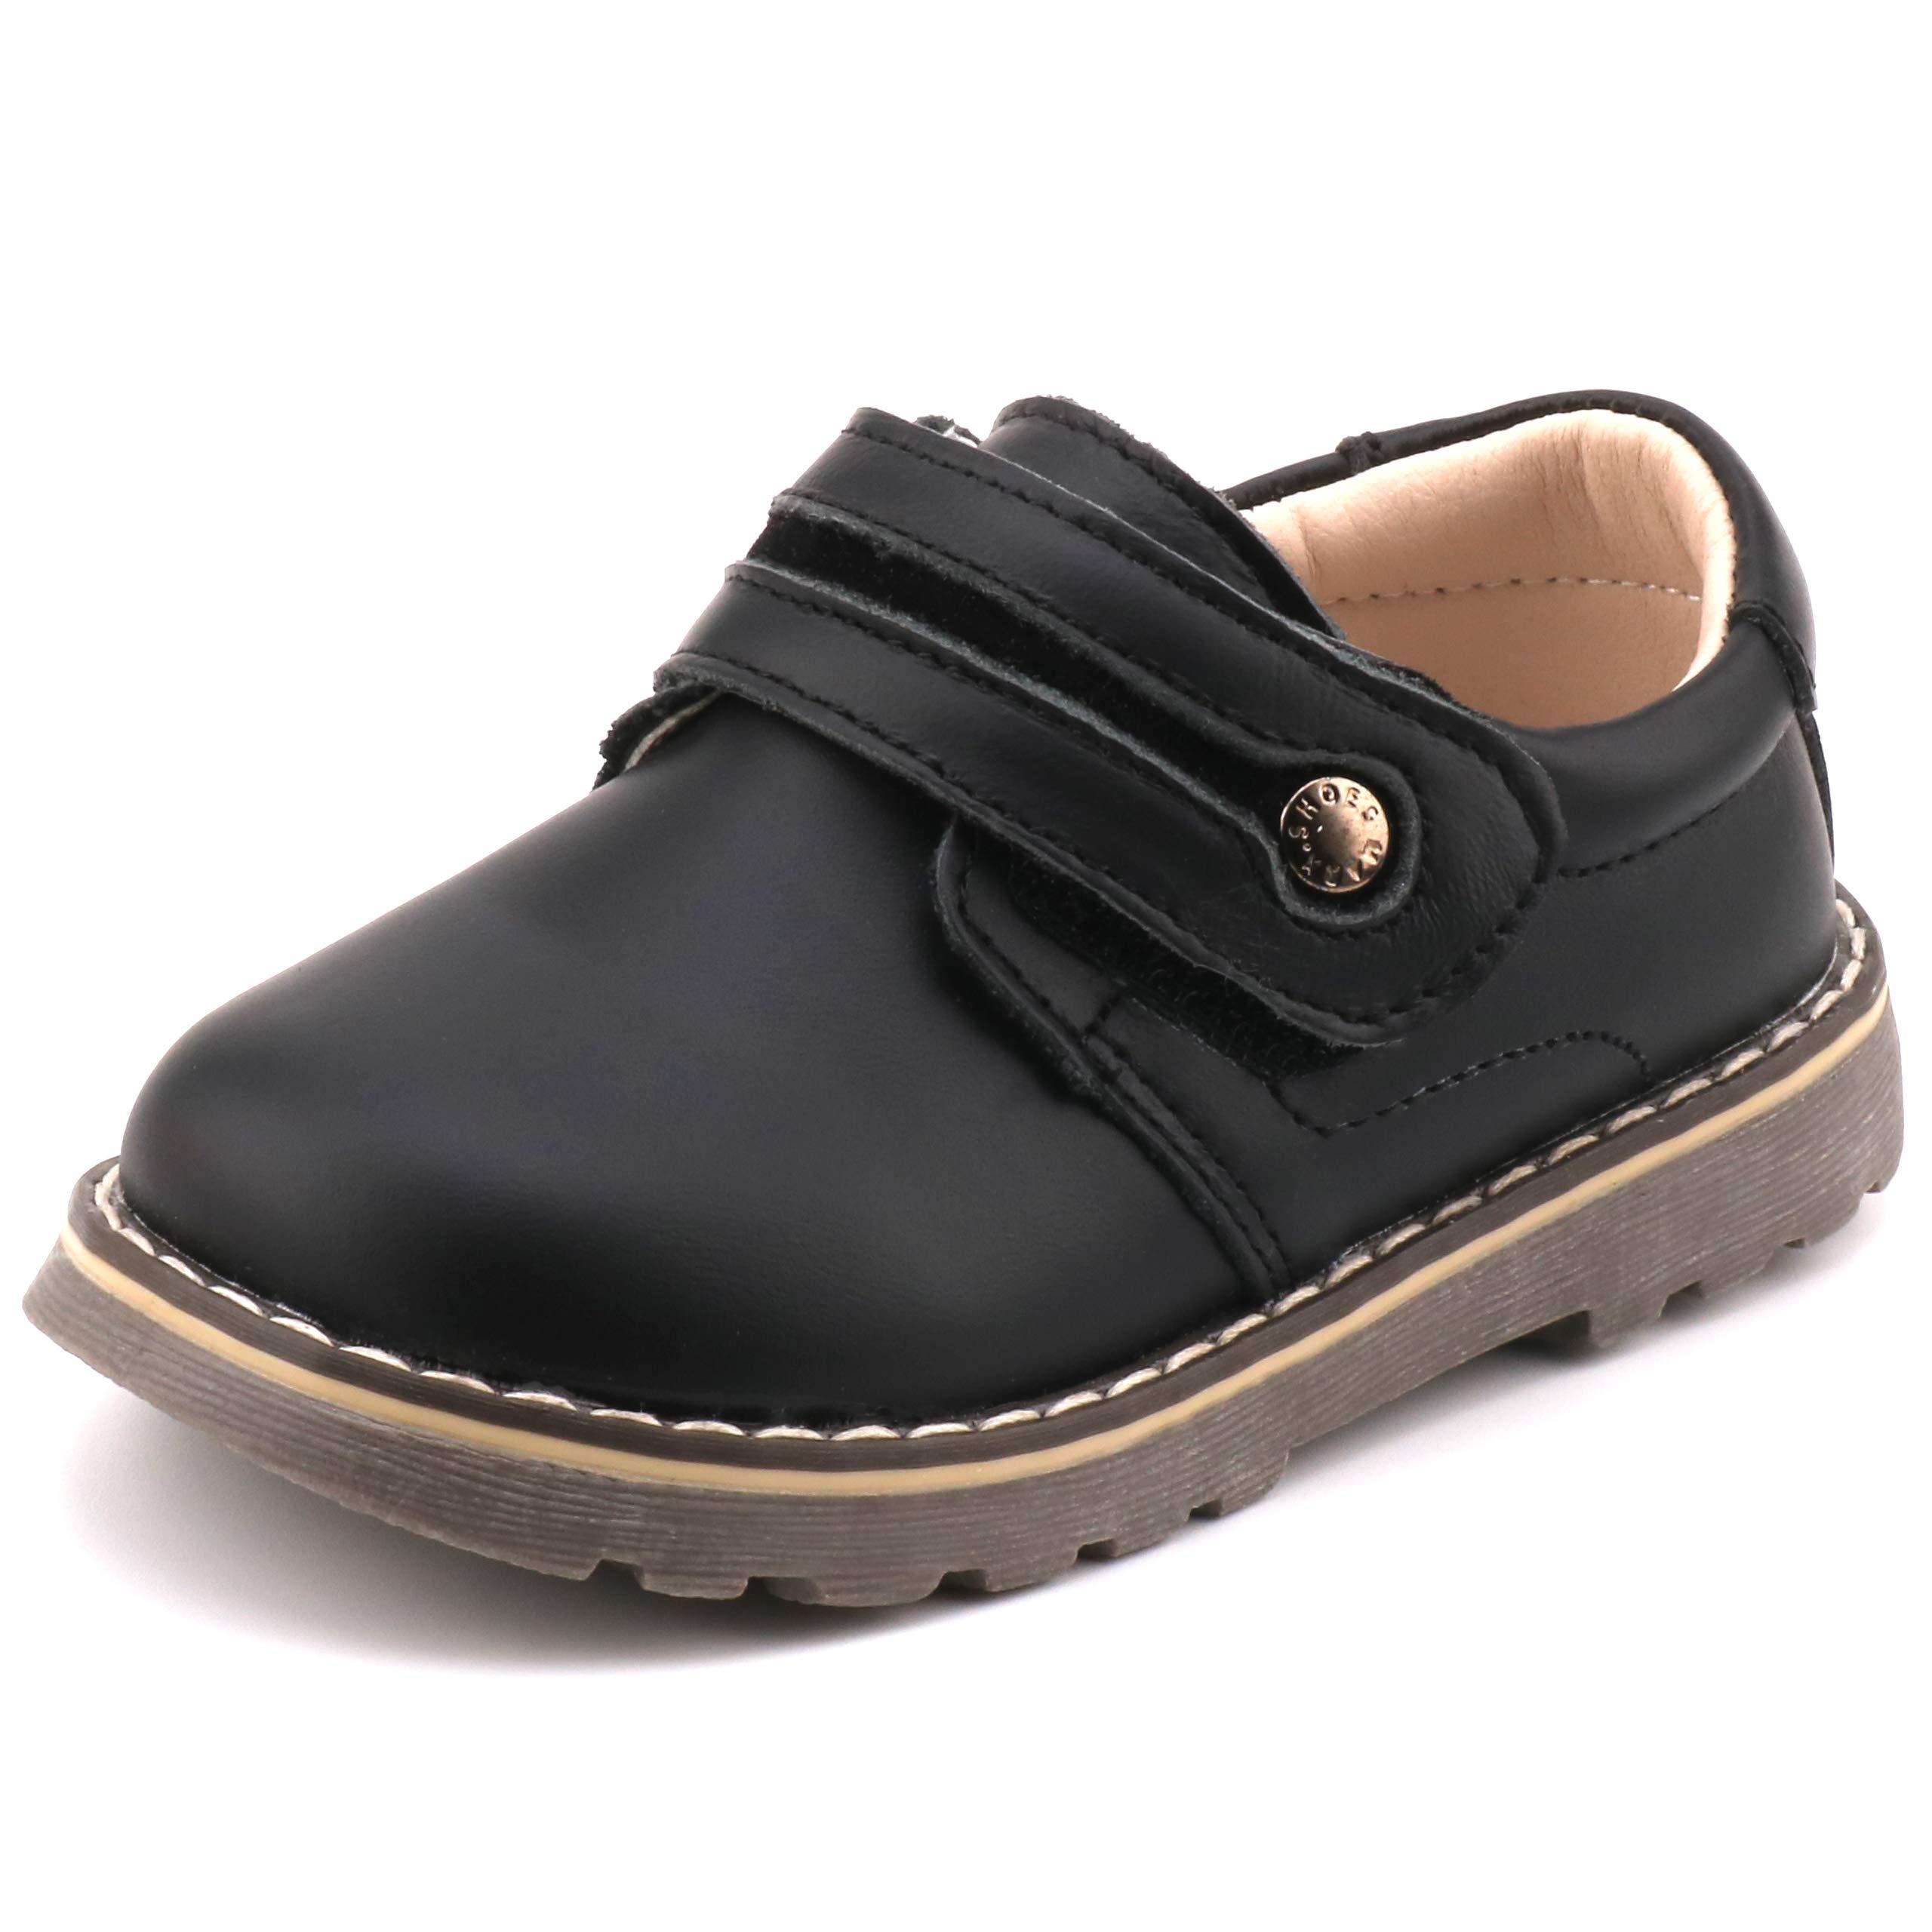 Femizee Toddler Boys Leather Loafers Comfort Uniform Oxford Dress Wedding Shoes, Black, 1327 CN23